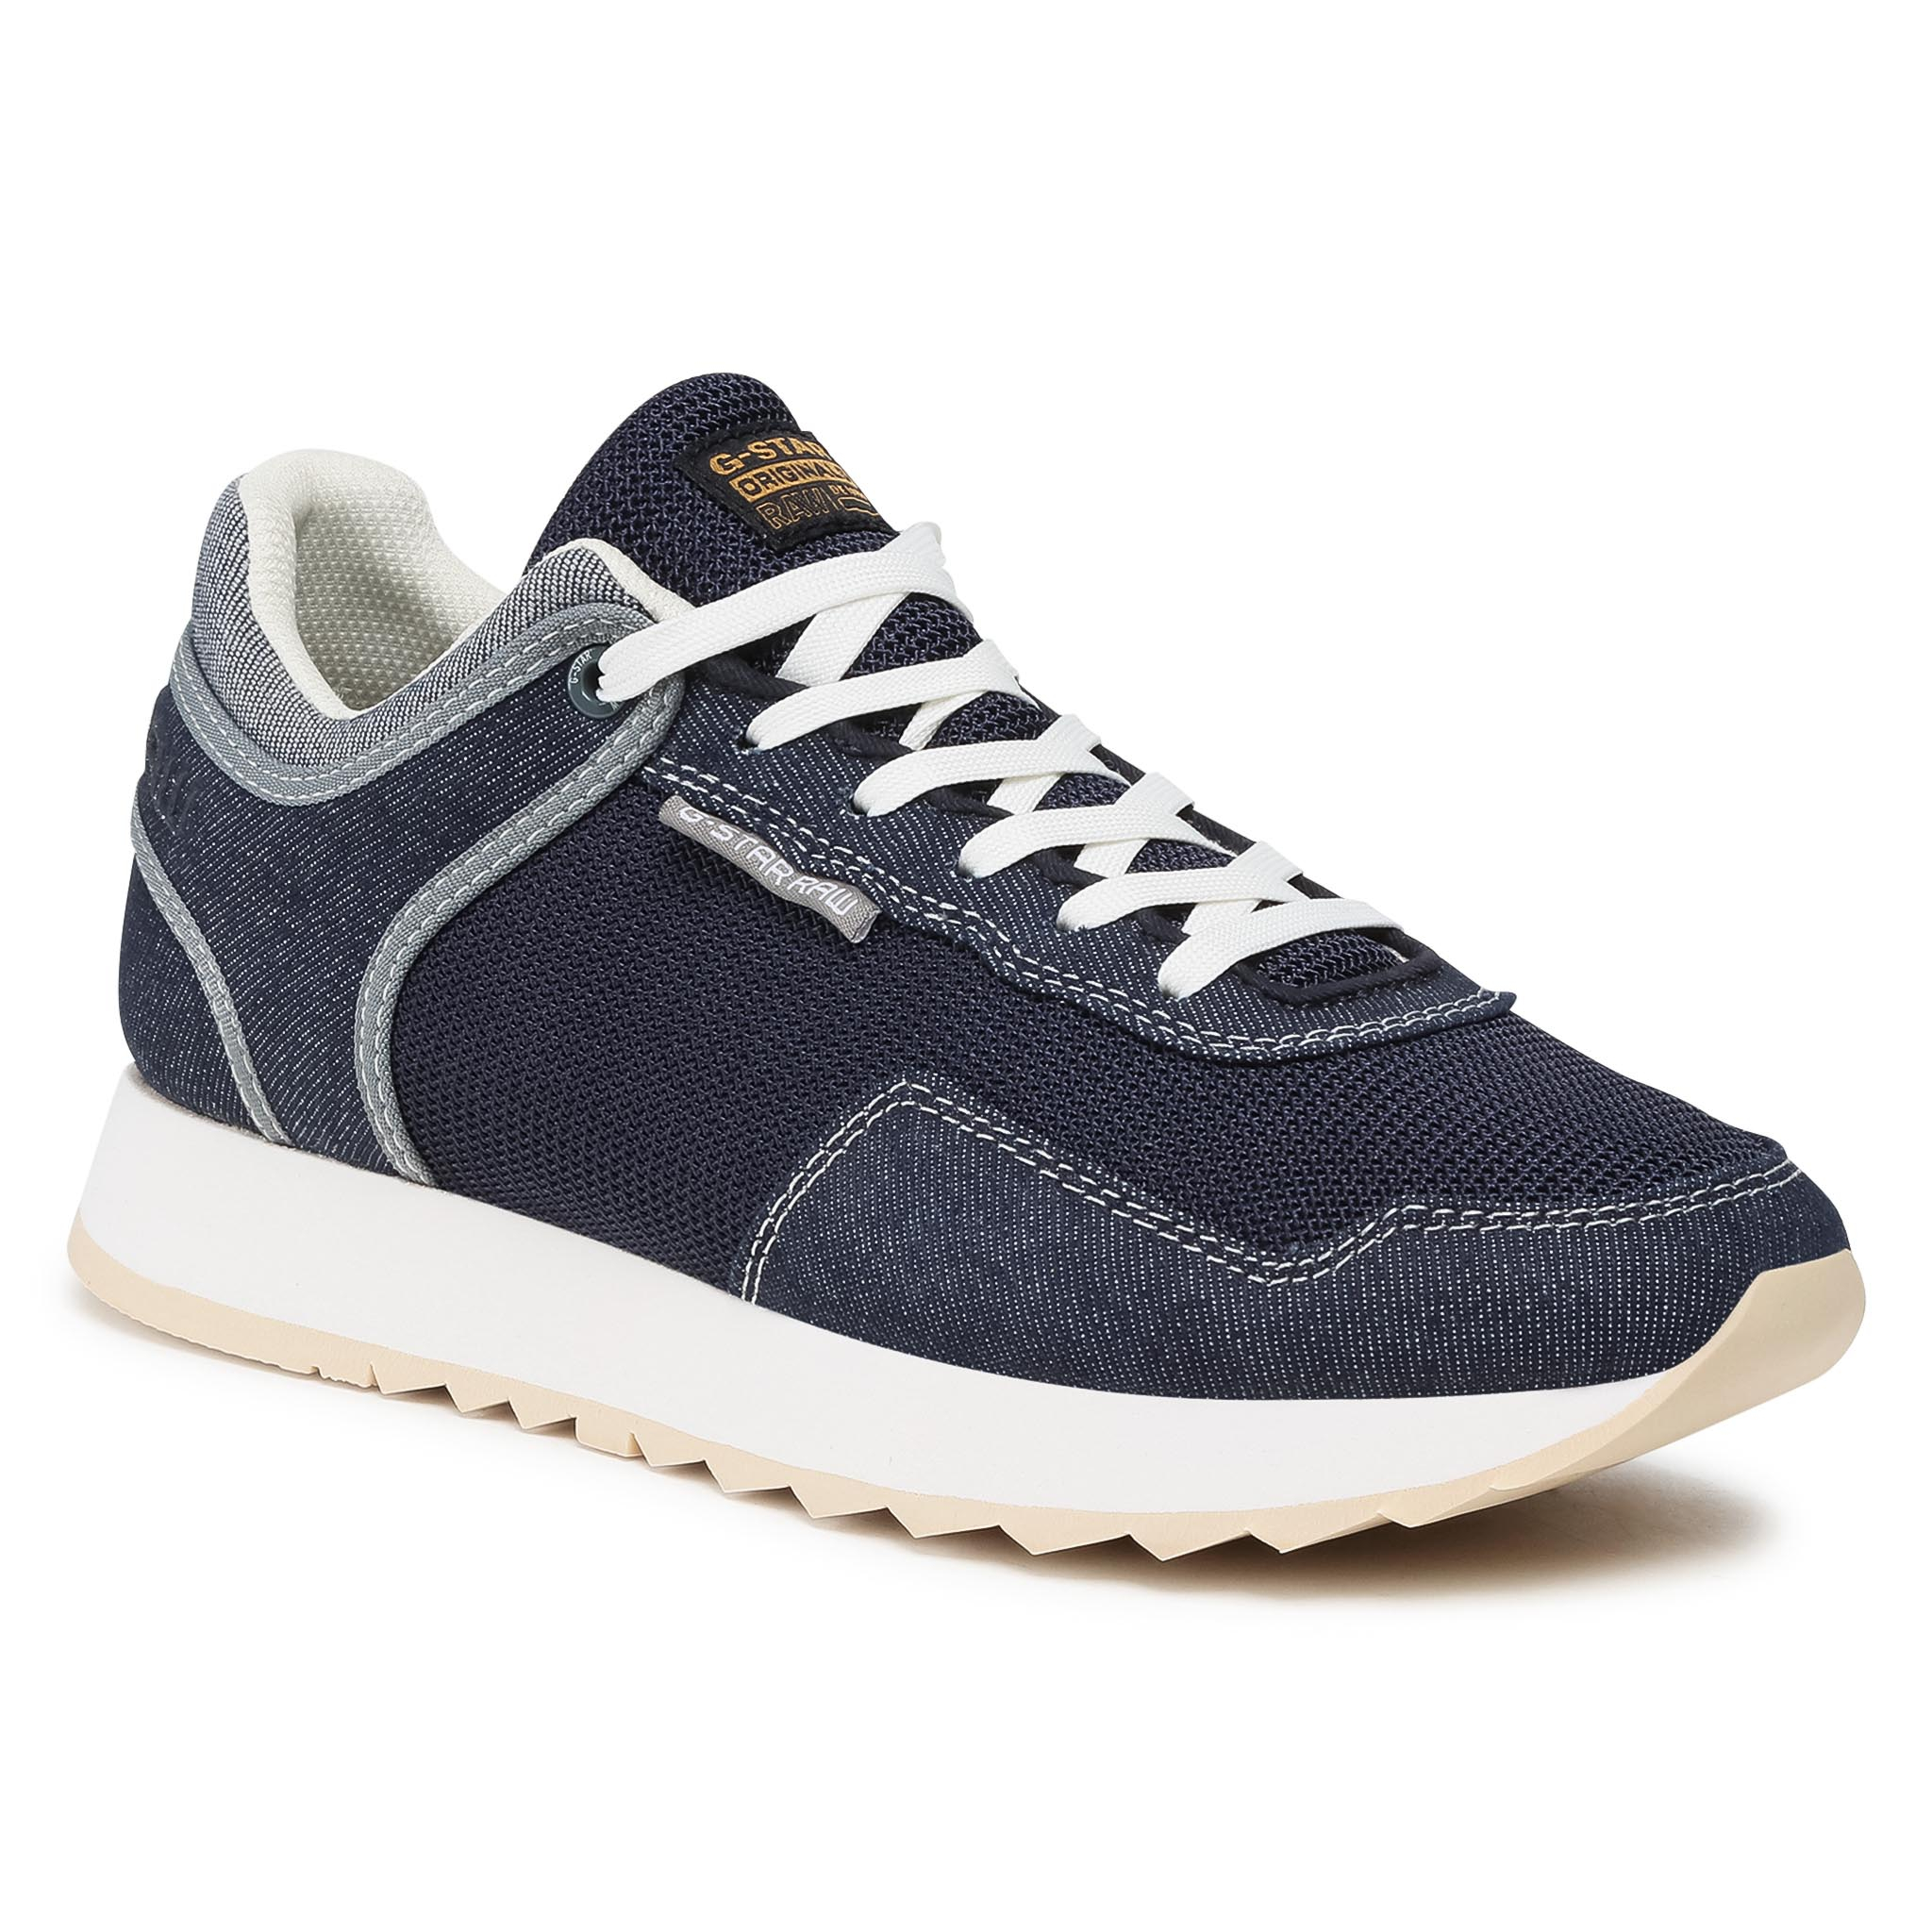 Sneakers G-STAR RAW - Calow D19899-C511-6486 Dk Saru Blue